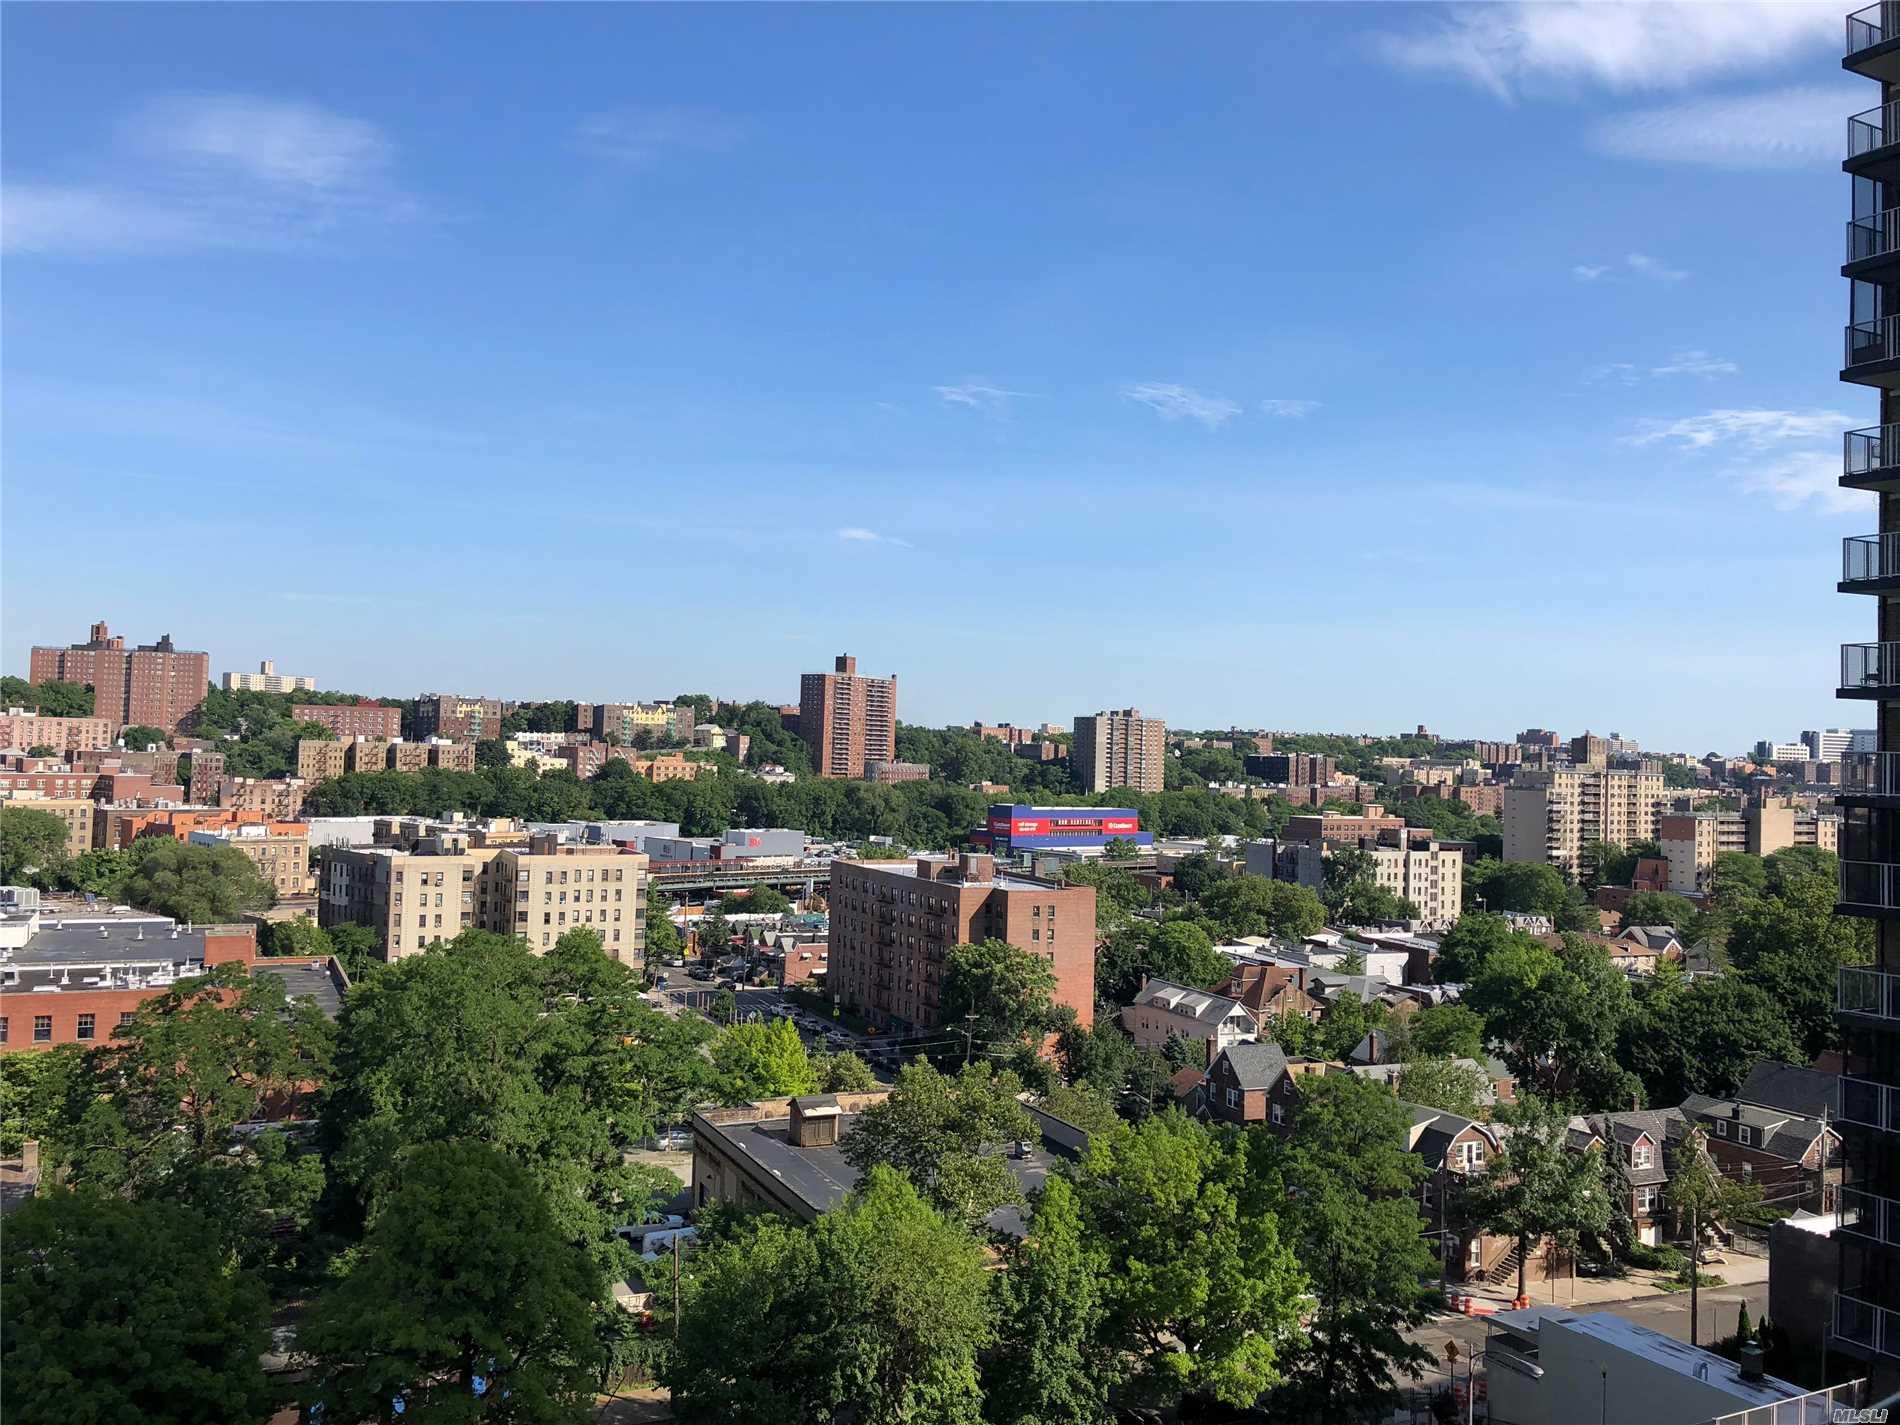 3816 Waldo Ave, Bronx, New York